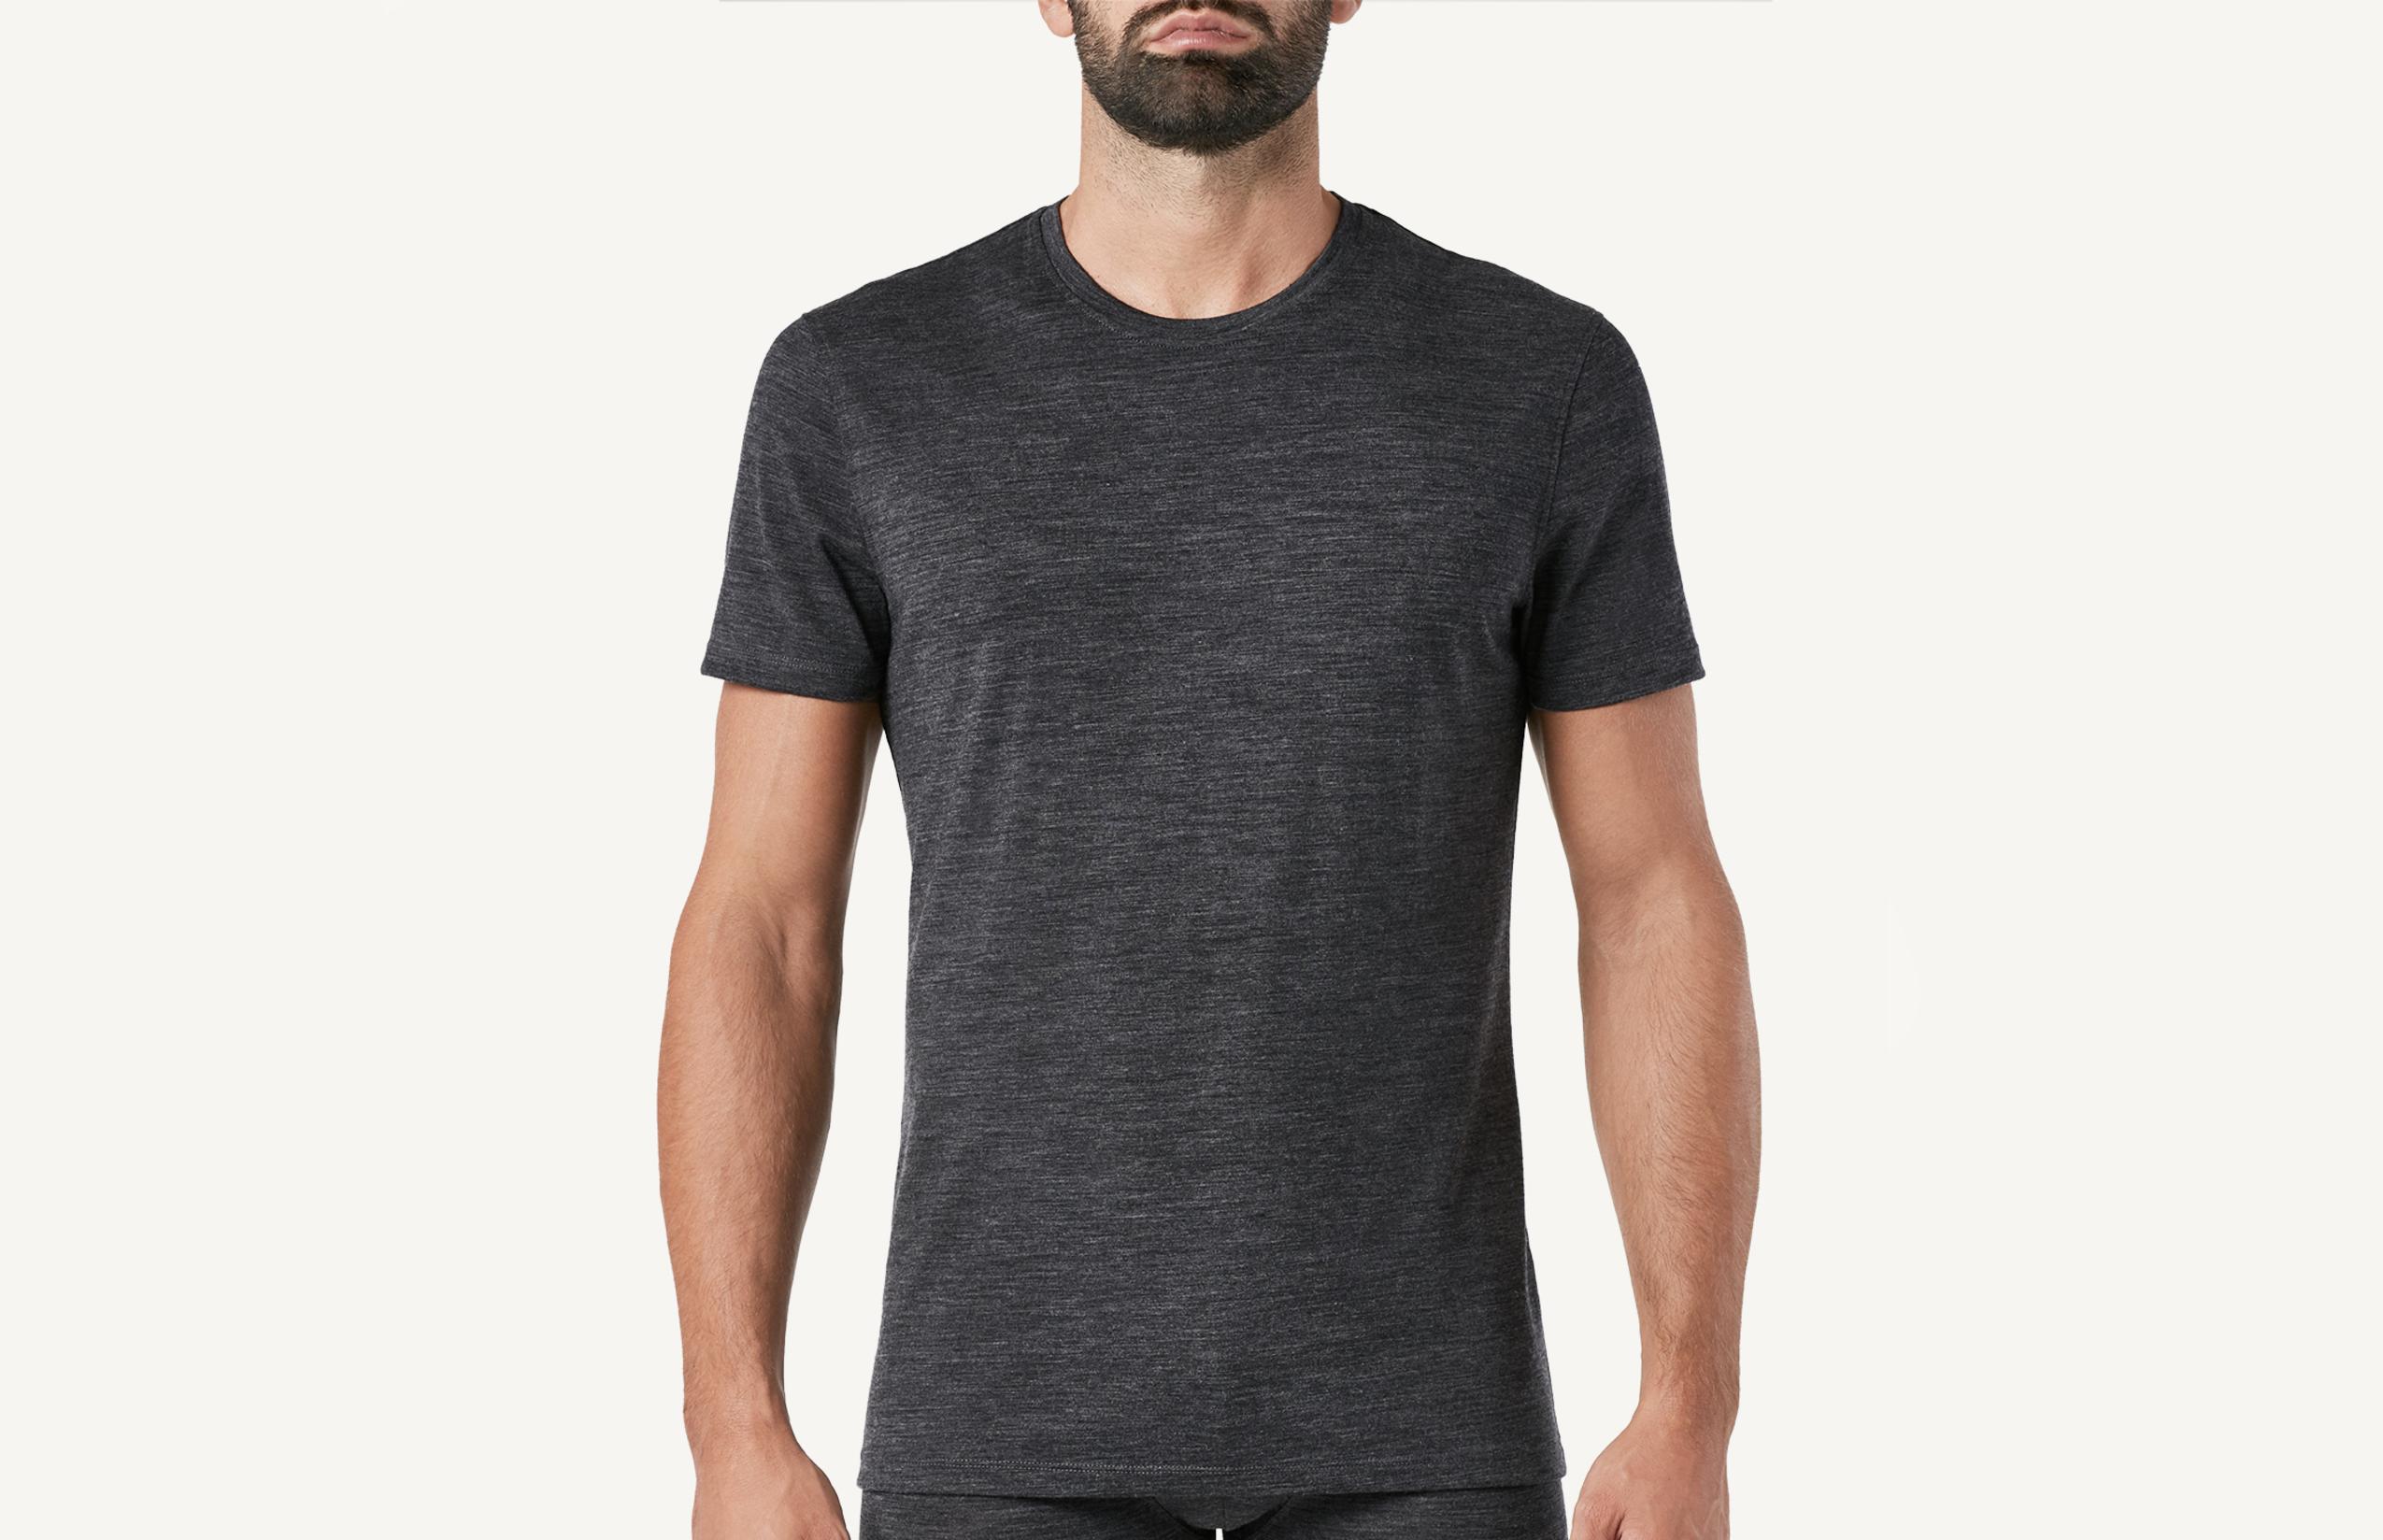 intimissimi - Kurzarm-T-Shirt aus Stretch-Merinowolle